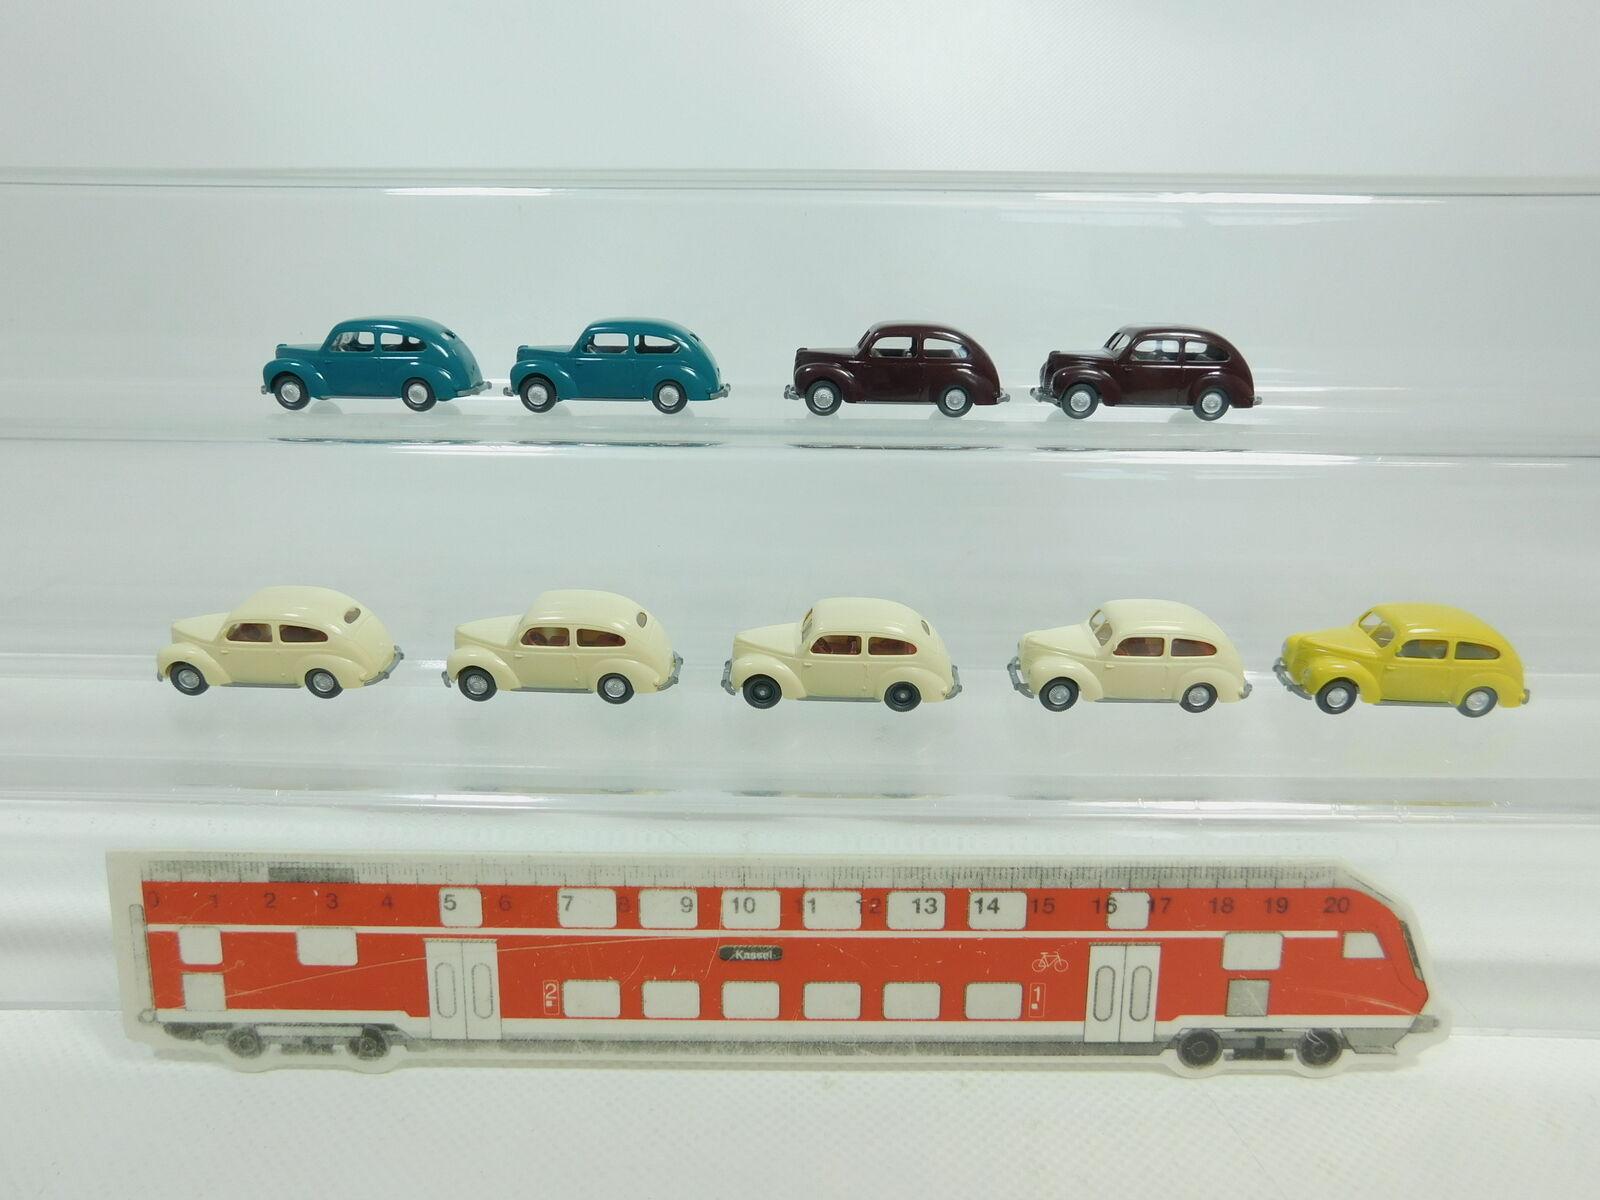 Bk65-0, 5 h0  9x Wiking h0 5 1 87 auto auto automobile Ford Taunus, TOP 2fc03a